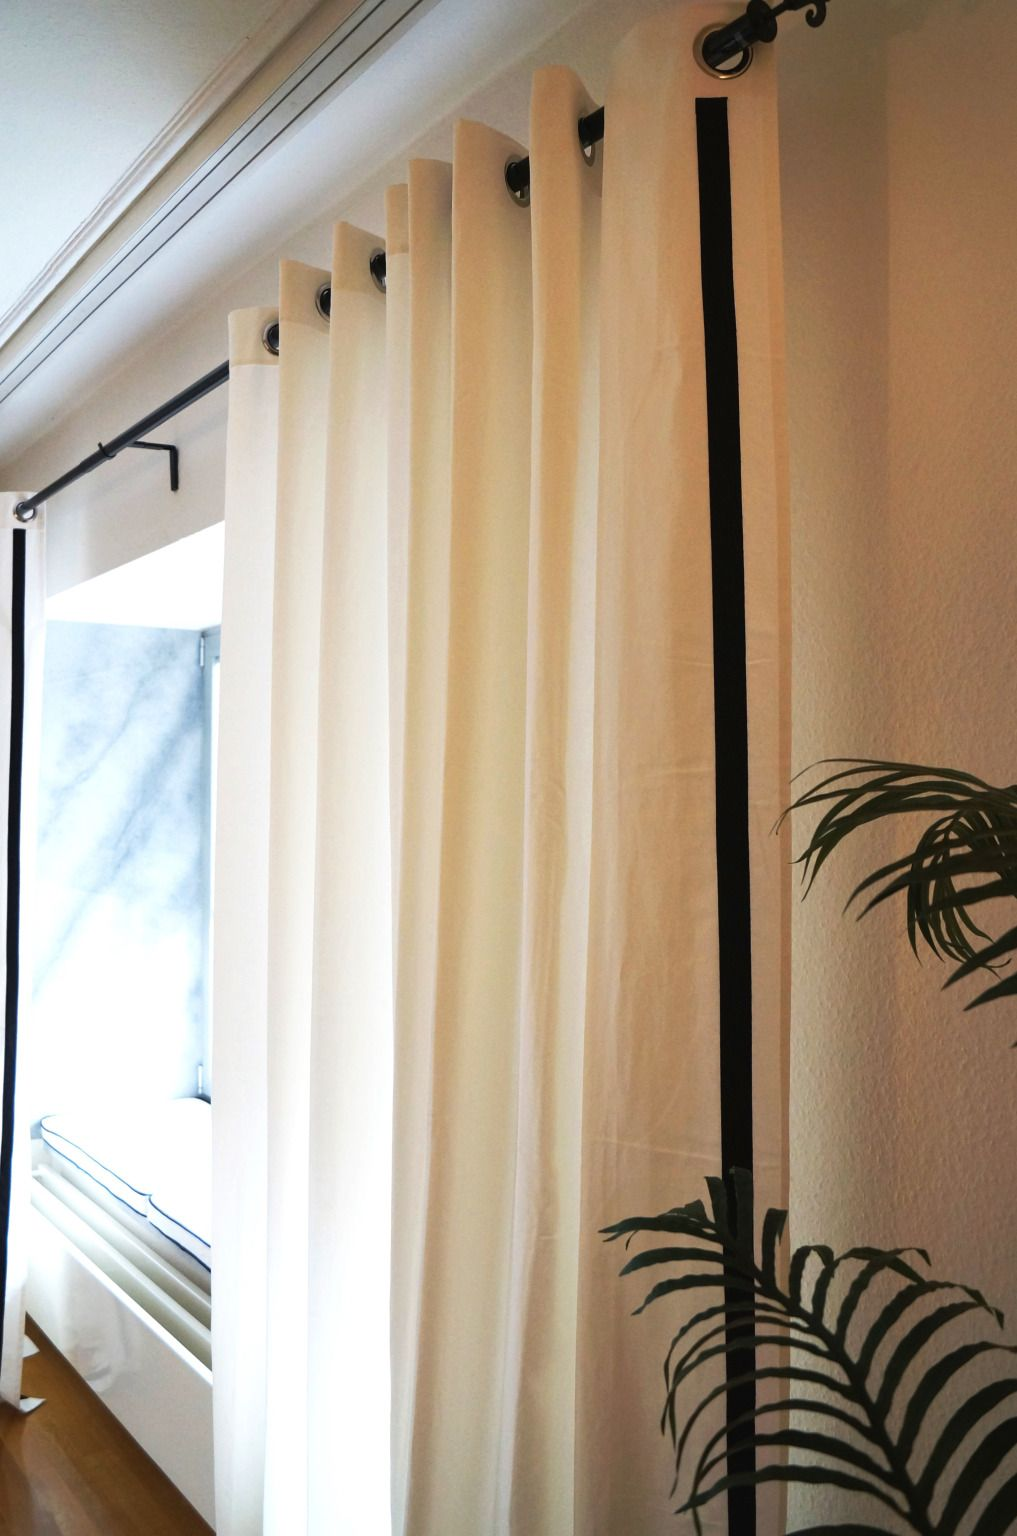 Ikea Merete Curtains Get An Upgrade Custom Drapes Curtains Ikea Curtains